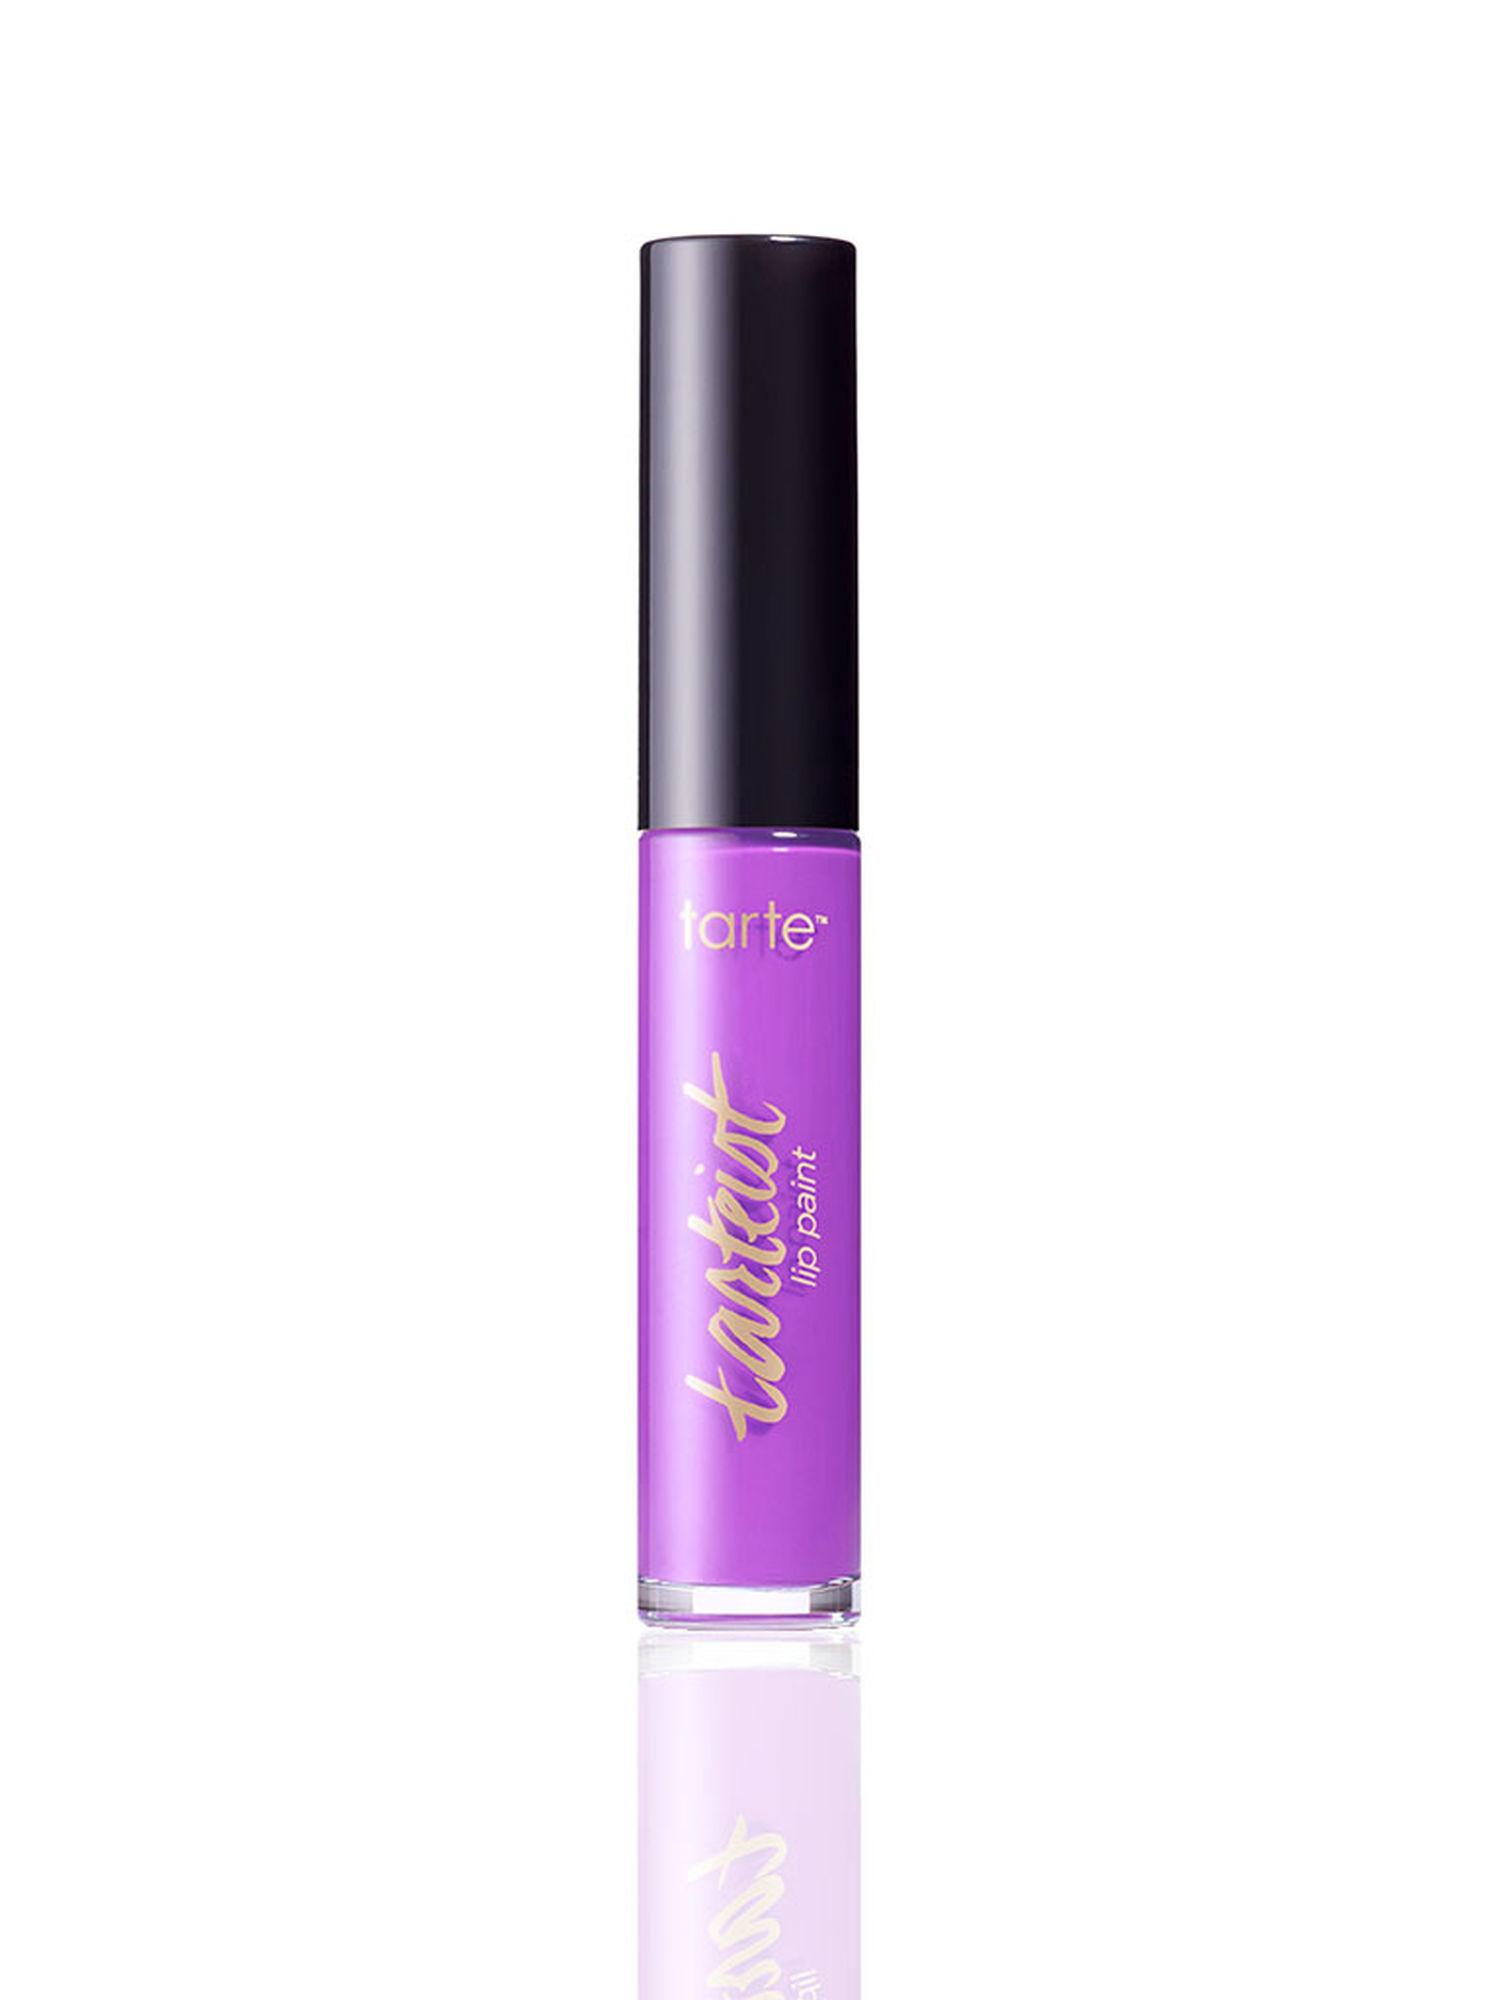 Кремовая матовая помада tarteist™ creamy matte lip paint